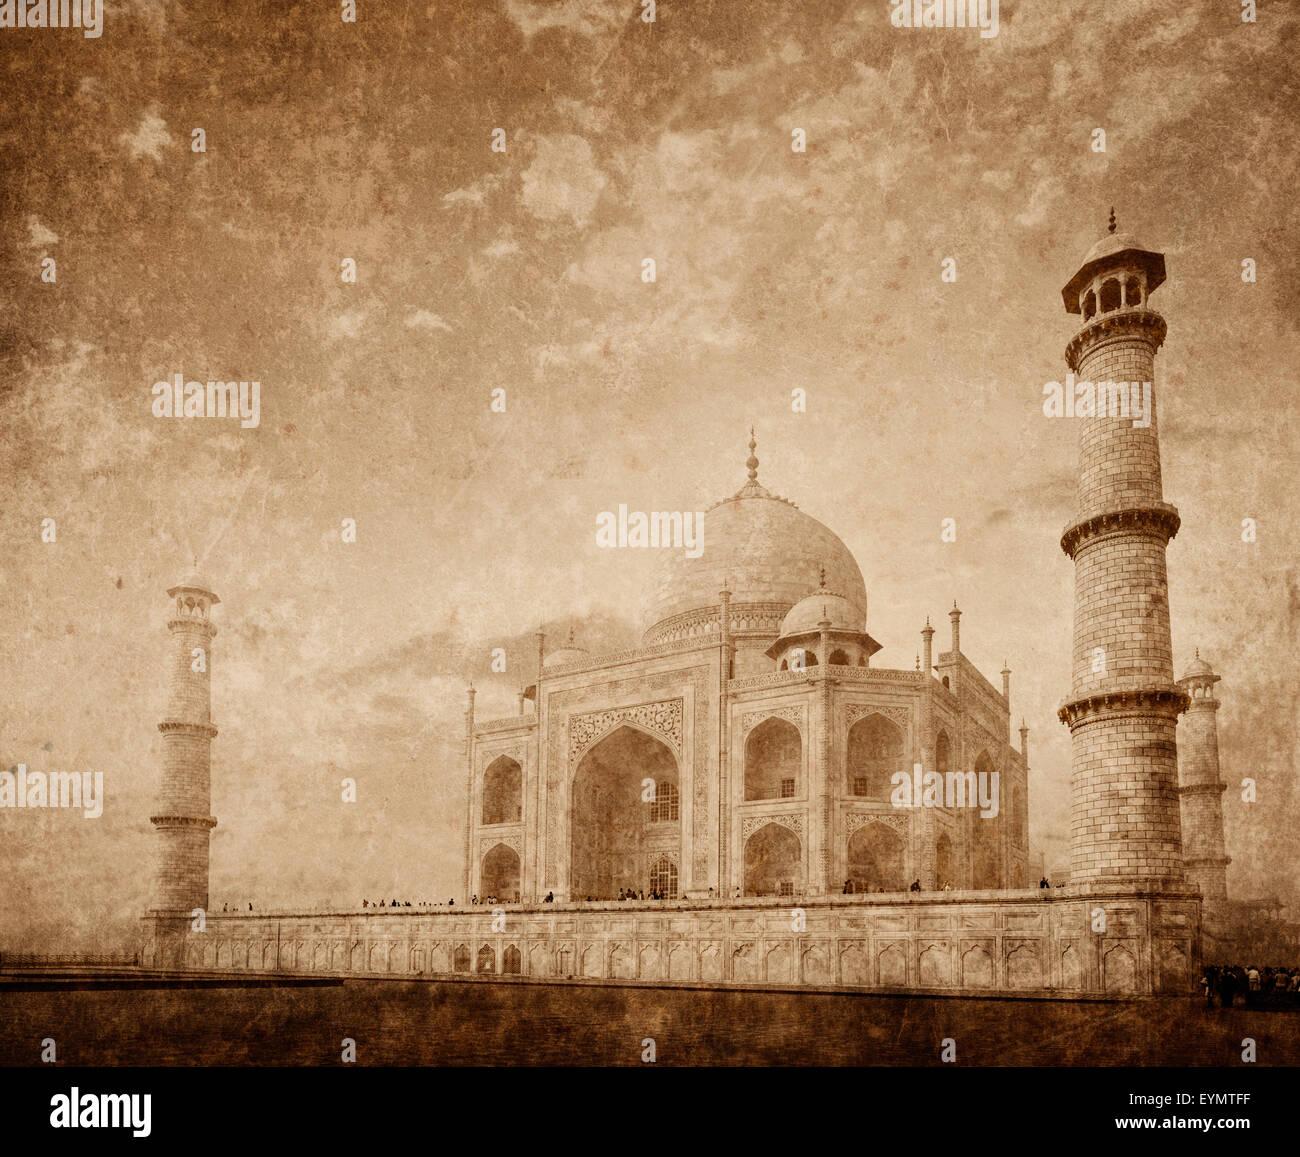 Taj Mahal Indian Symbol - India travel background  with grunge texture overlaid. Agra, India - Stock Image